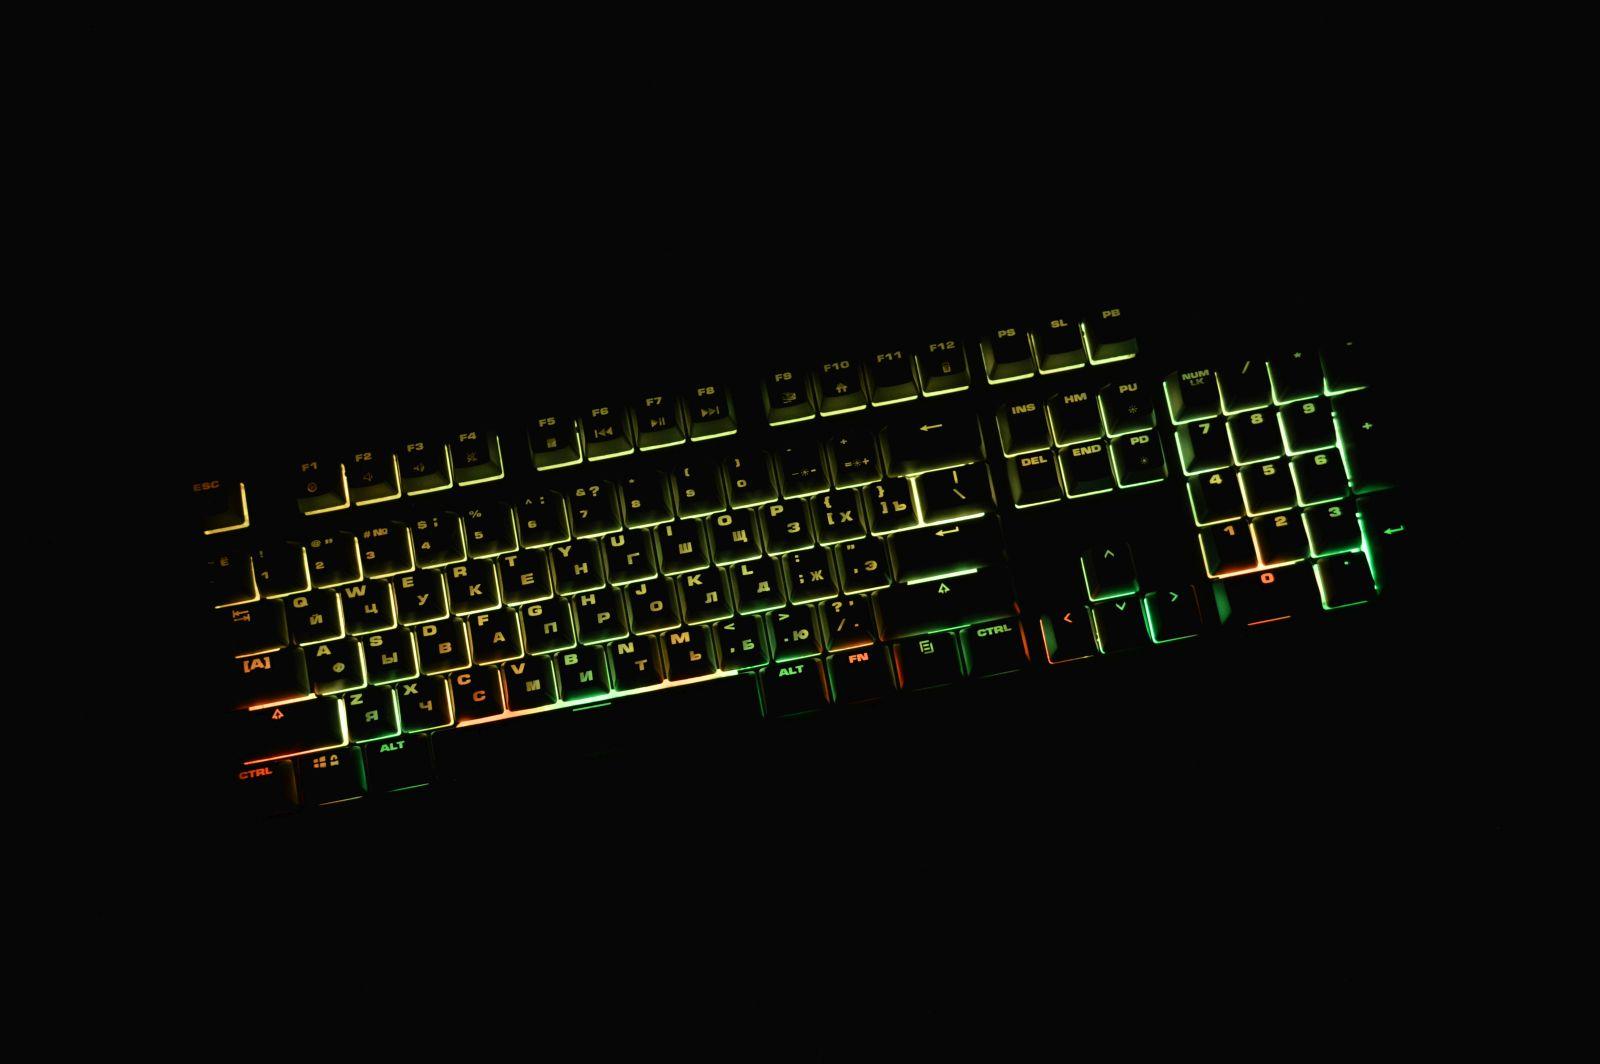 Mad Catz S.T.R.I.K.E. 2 в полной темноте